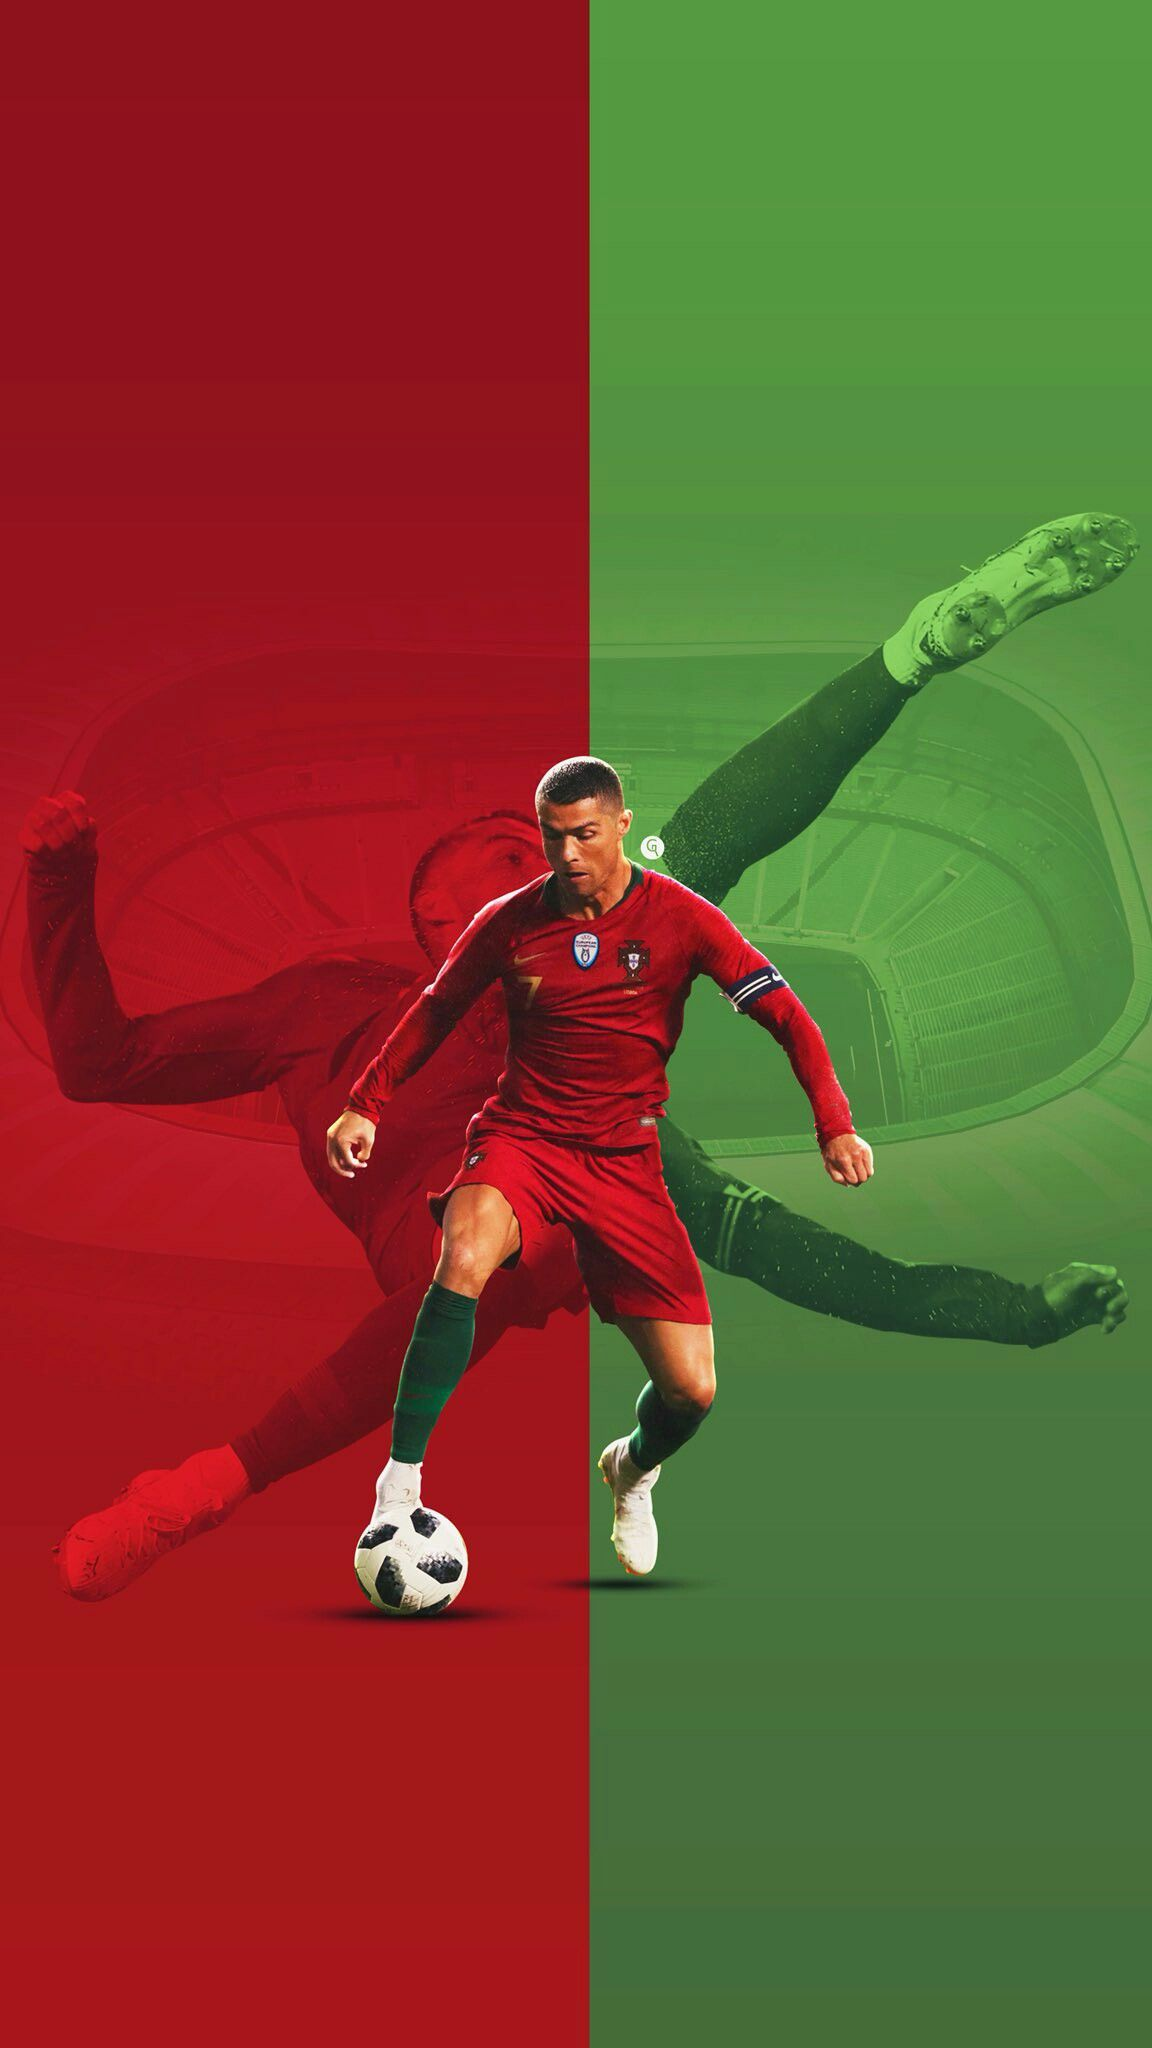 No 7 Cristiano Ronaldo Portugal Cristiano Ronaldo Futebol Arte Futebol